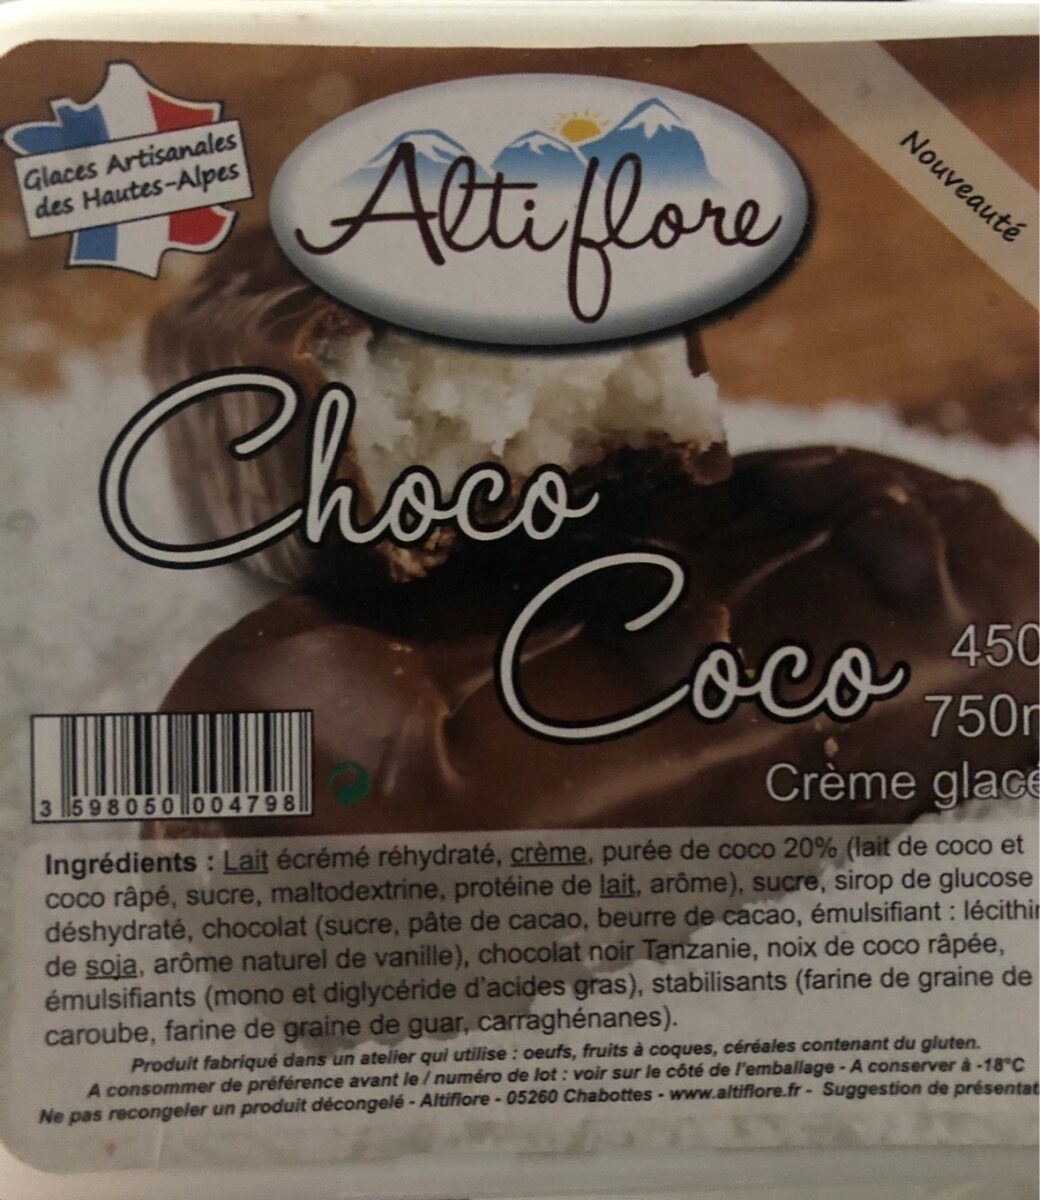 Glace Choco coco - Produit - fr